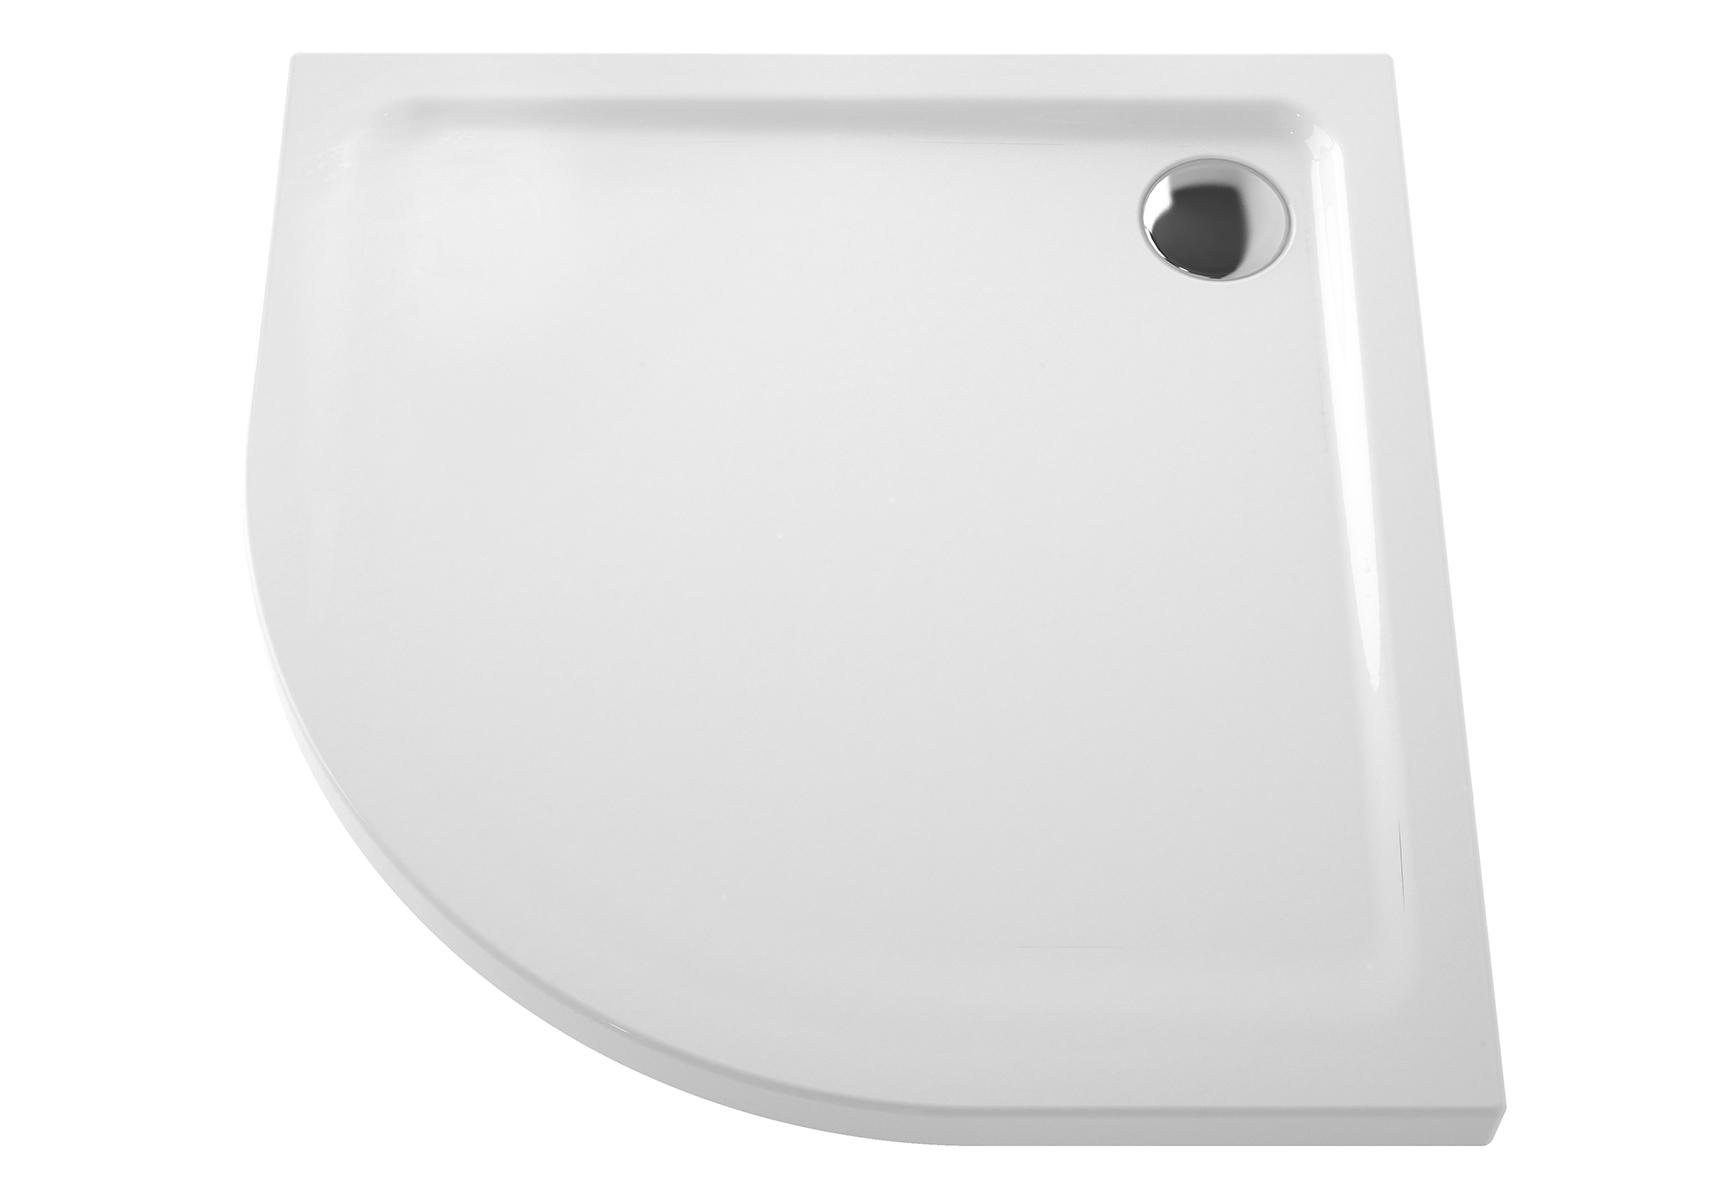 Arkitekt receveur à encastrer ou à poser extra plat, 90  x  90 cm, quart de rond